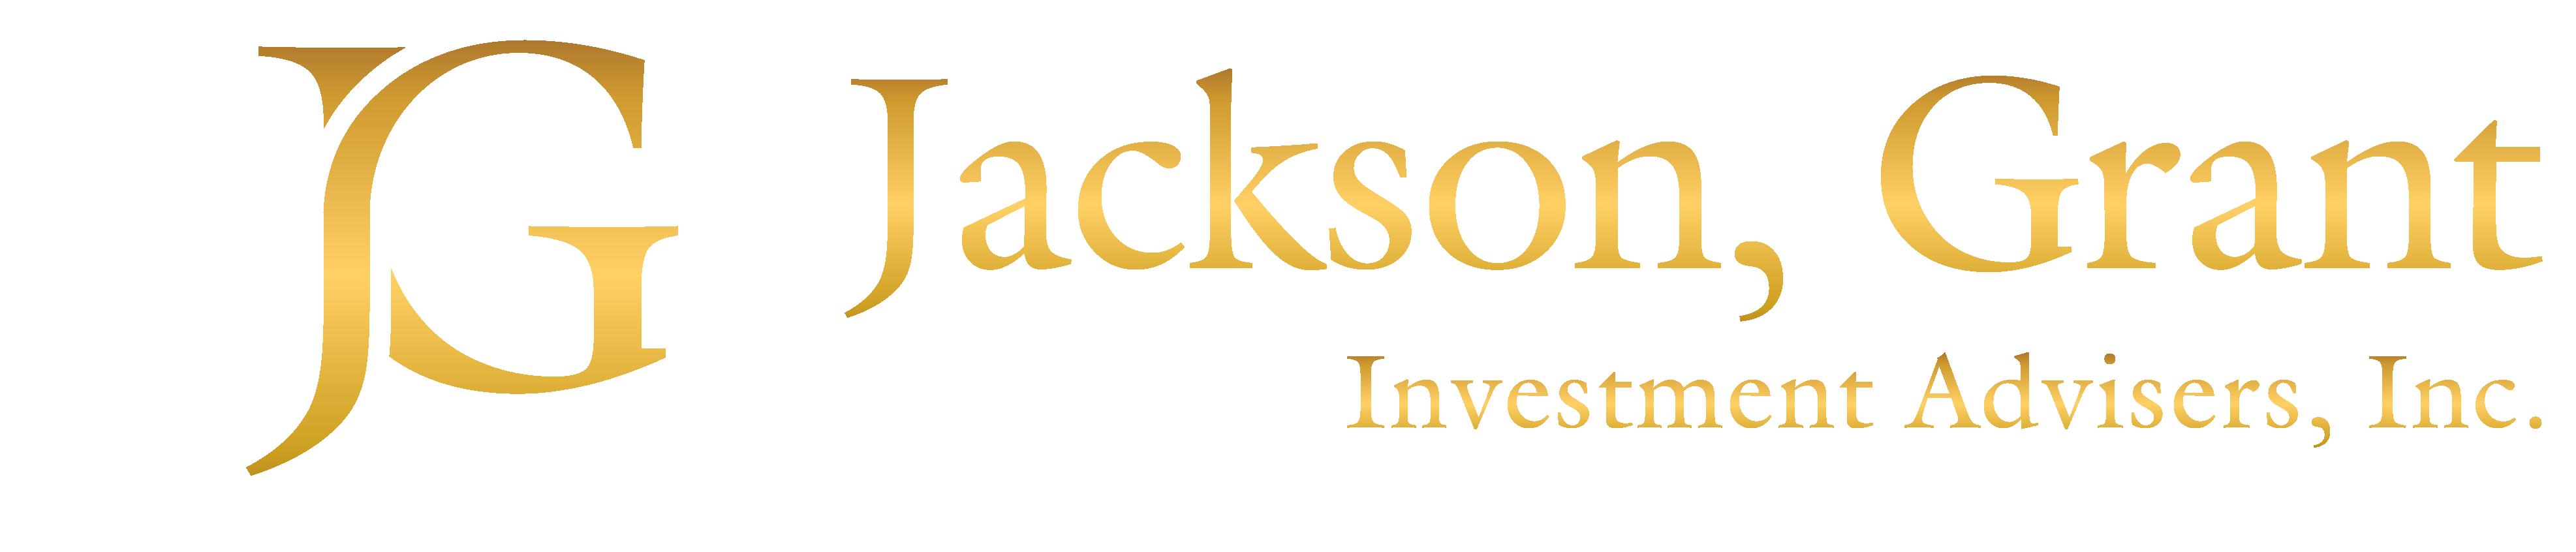 Jackson, Grant